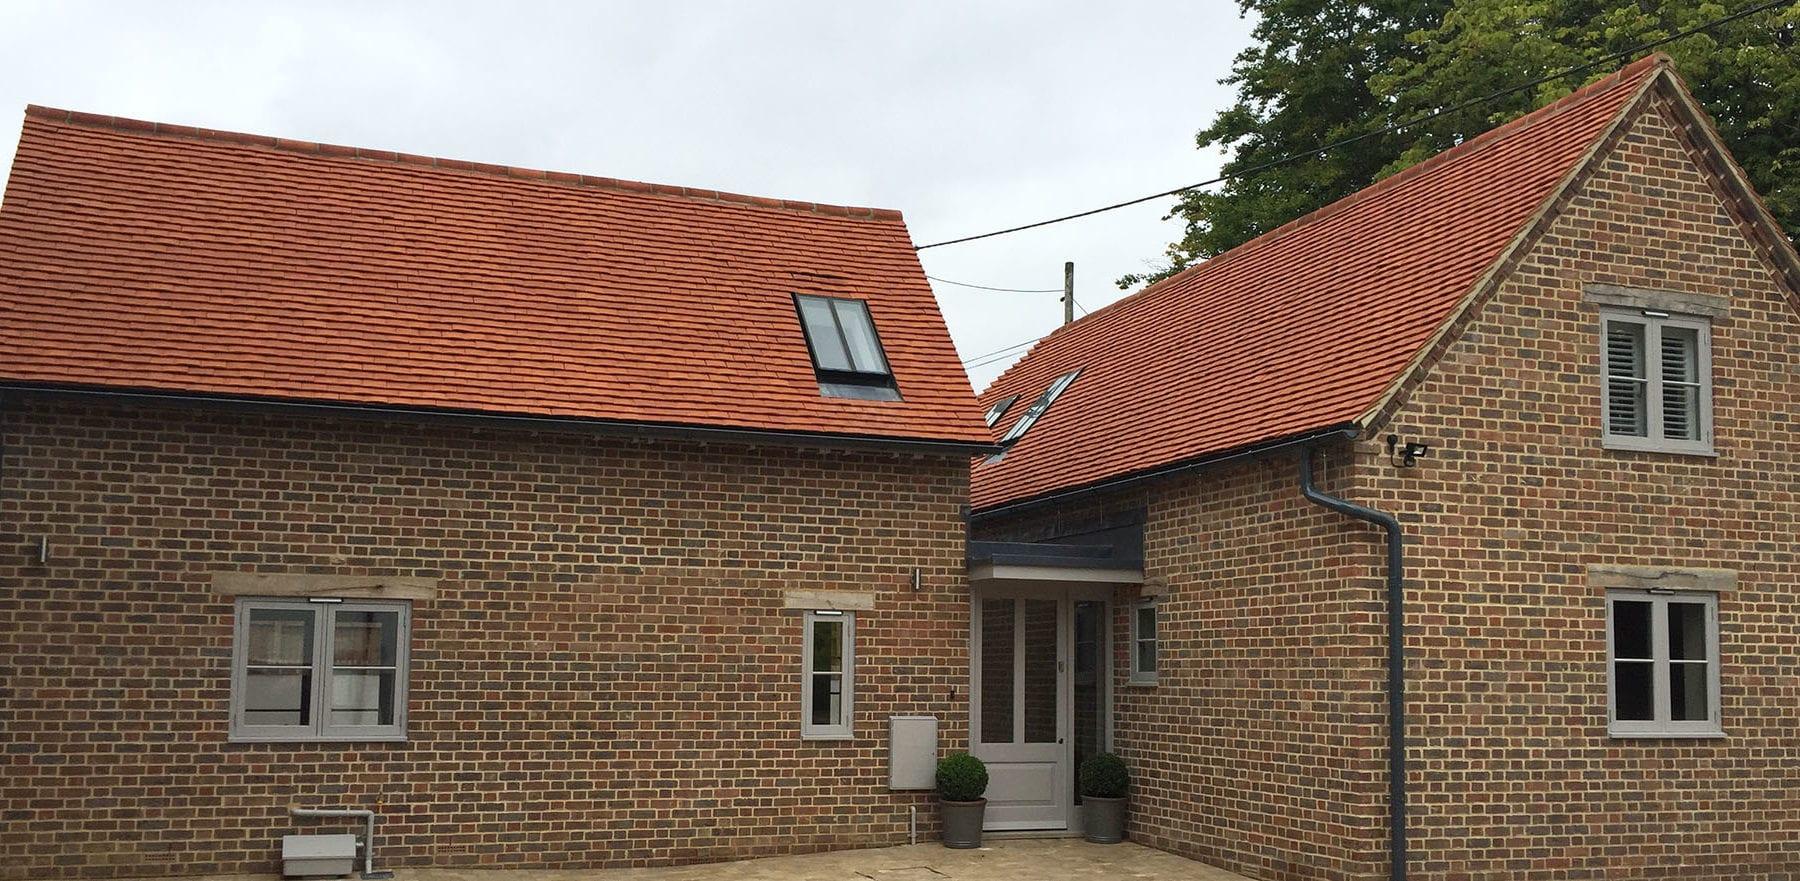 Lifestiles - Handcrafted Orange Clay Roof Tiles - Aston, England